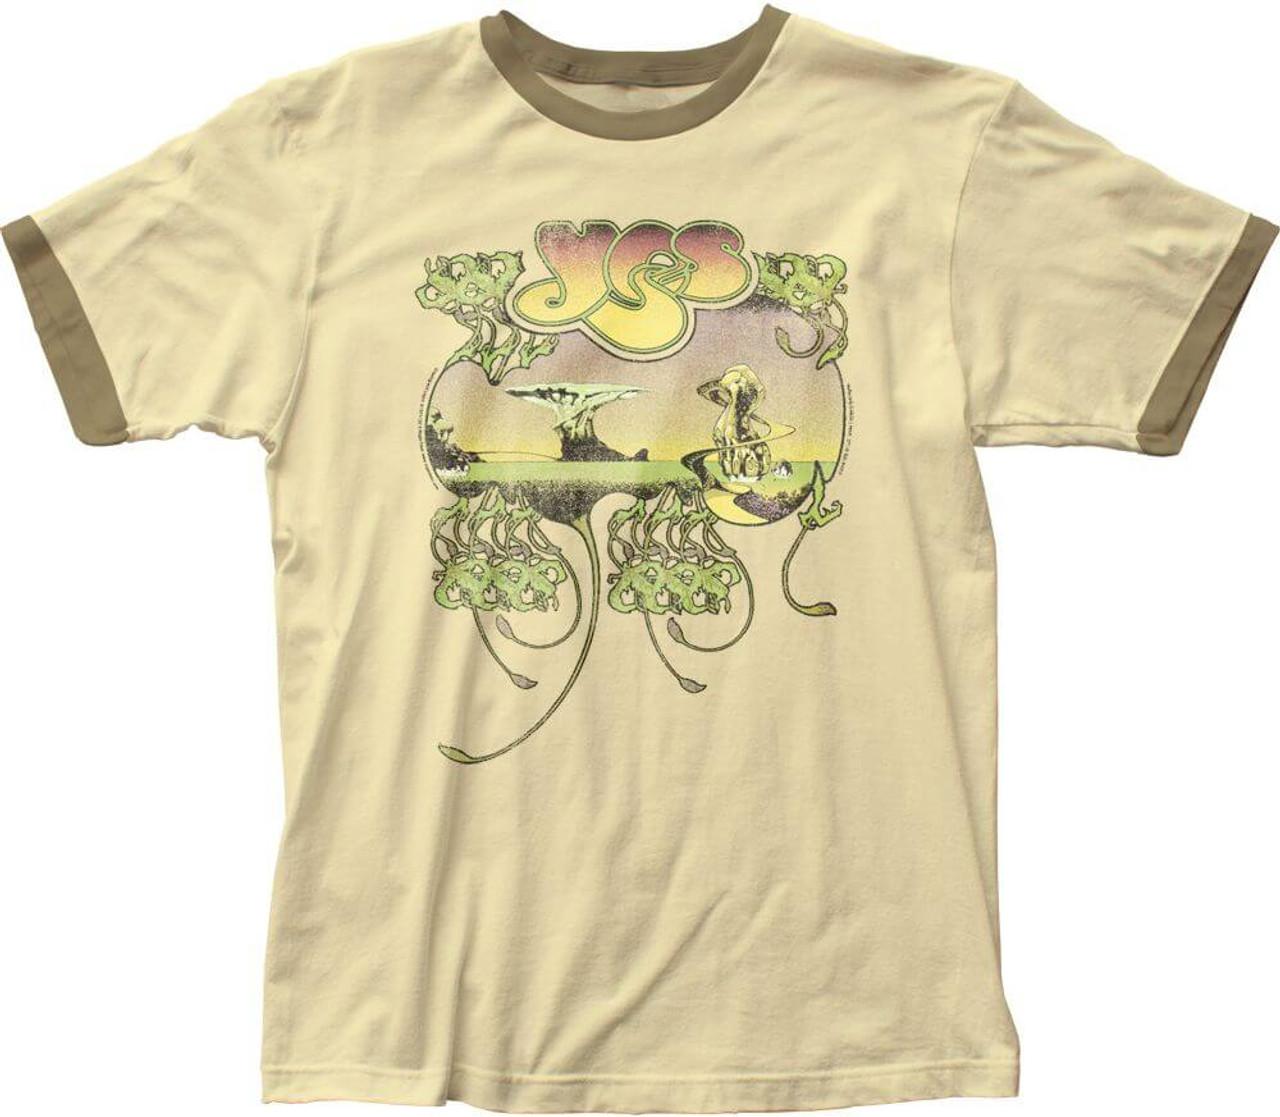 Amazon.com: YES - FRAGILE Album Cover - Adult T-Shirt: Clothing